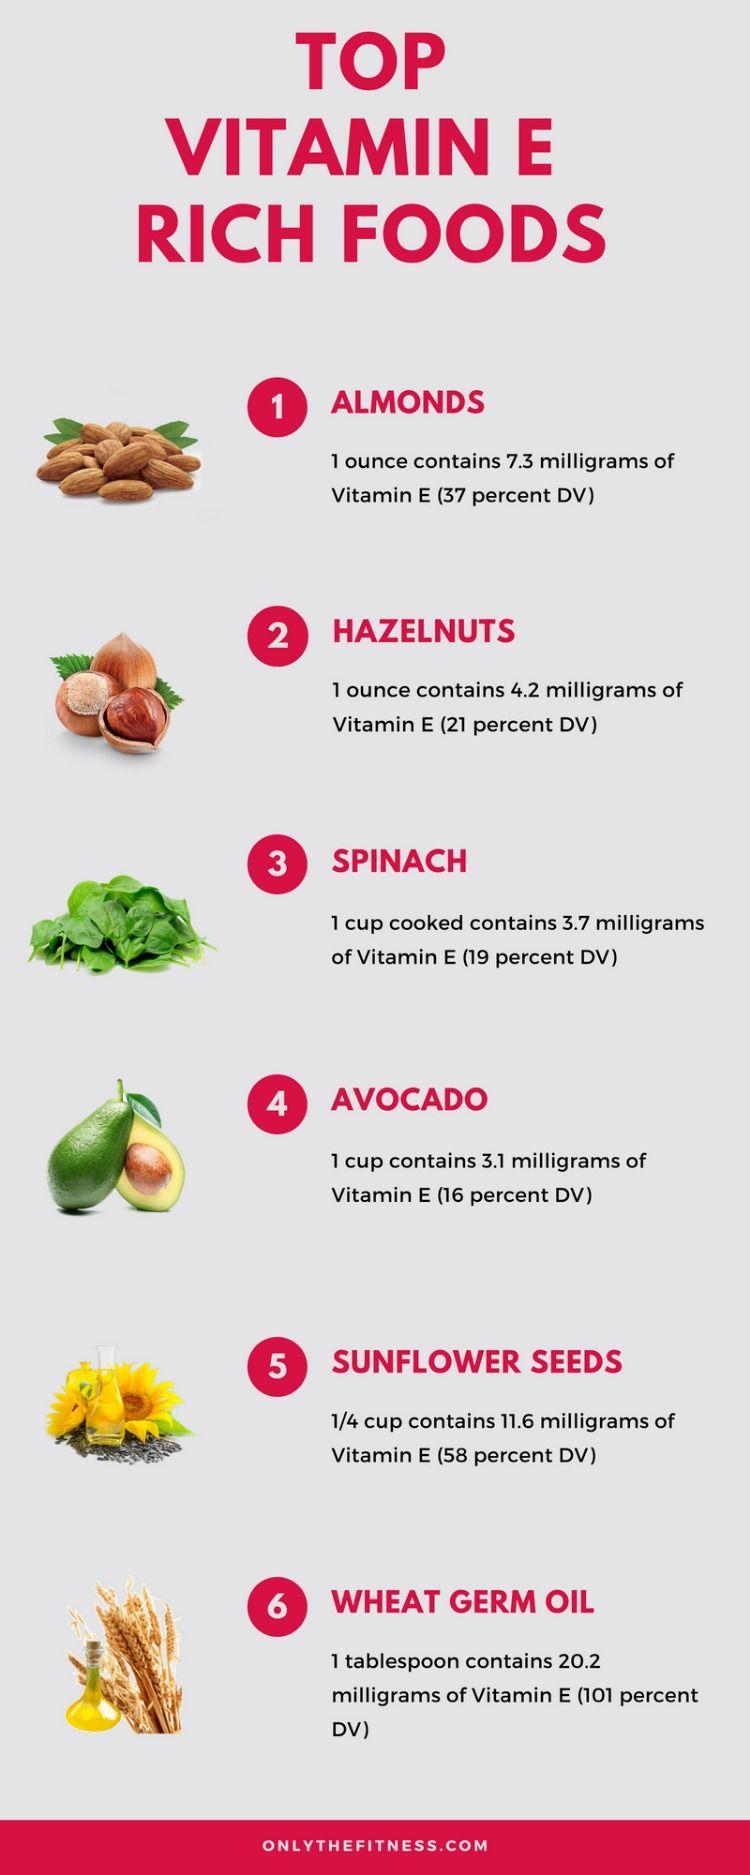 Vitamin B7 Biotin Beauty Vitamin For Healthier Hair Skin Nails Vitamin Rich Foods Biotin Rich Foods Vitamin A Foods